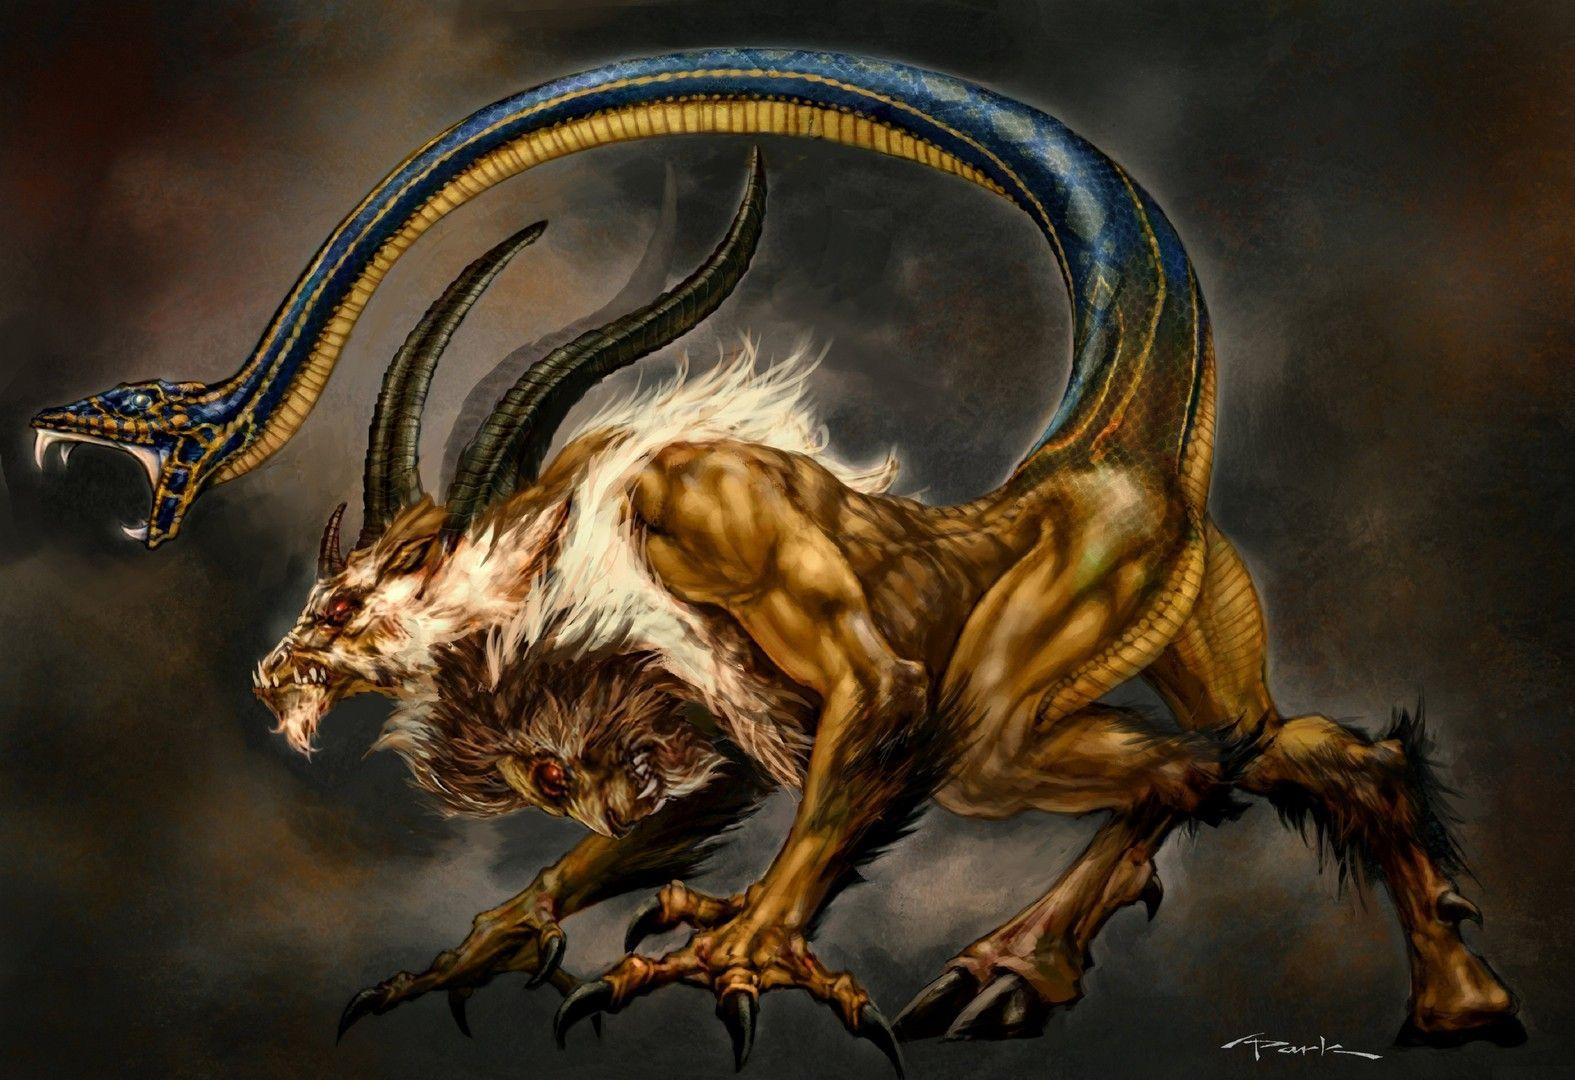 лошади существа из мифов и легенд картинки изображения